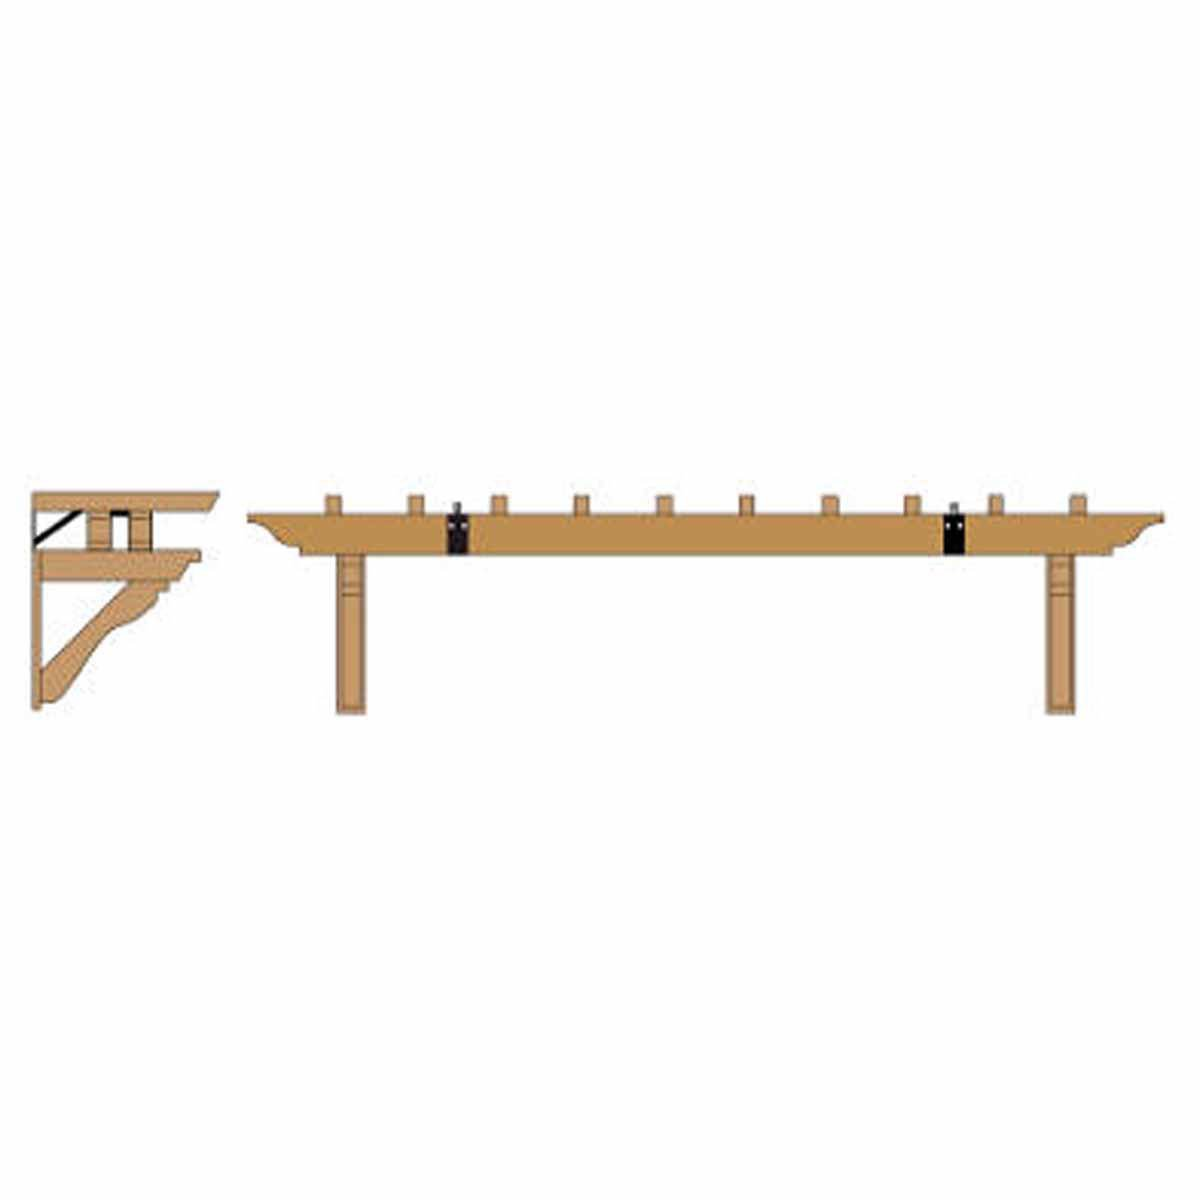 Fypon TRLS18987 Wood Grain Trellis Kit, Fits 16' and 18' Garage Doors